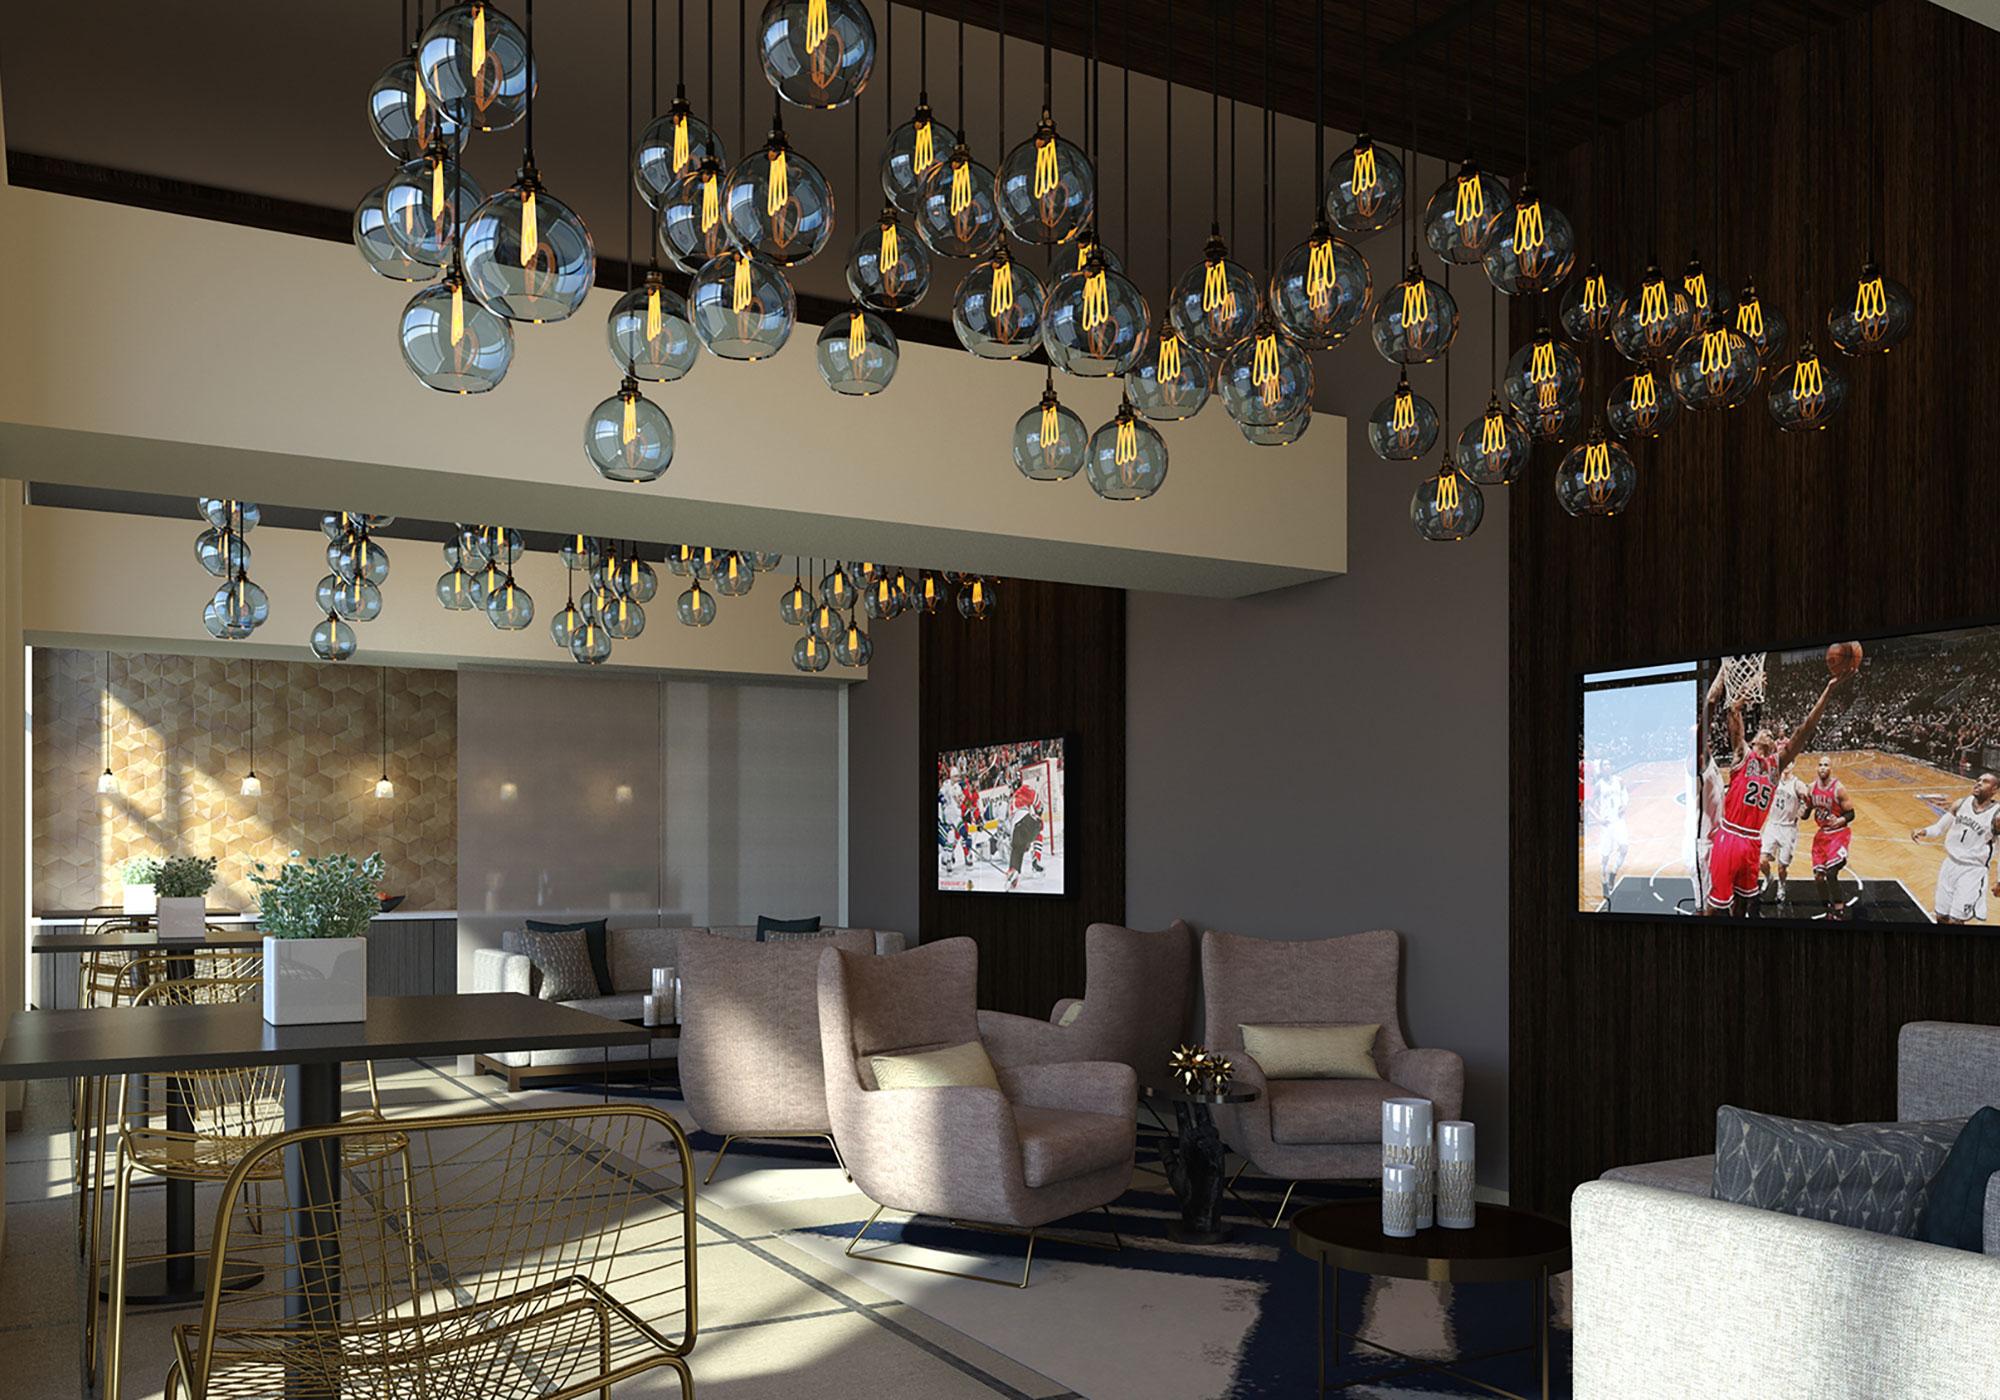 Rendering of room with chandelier